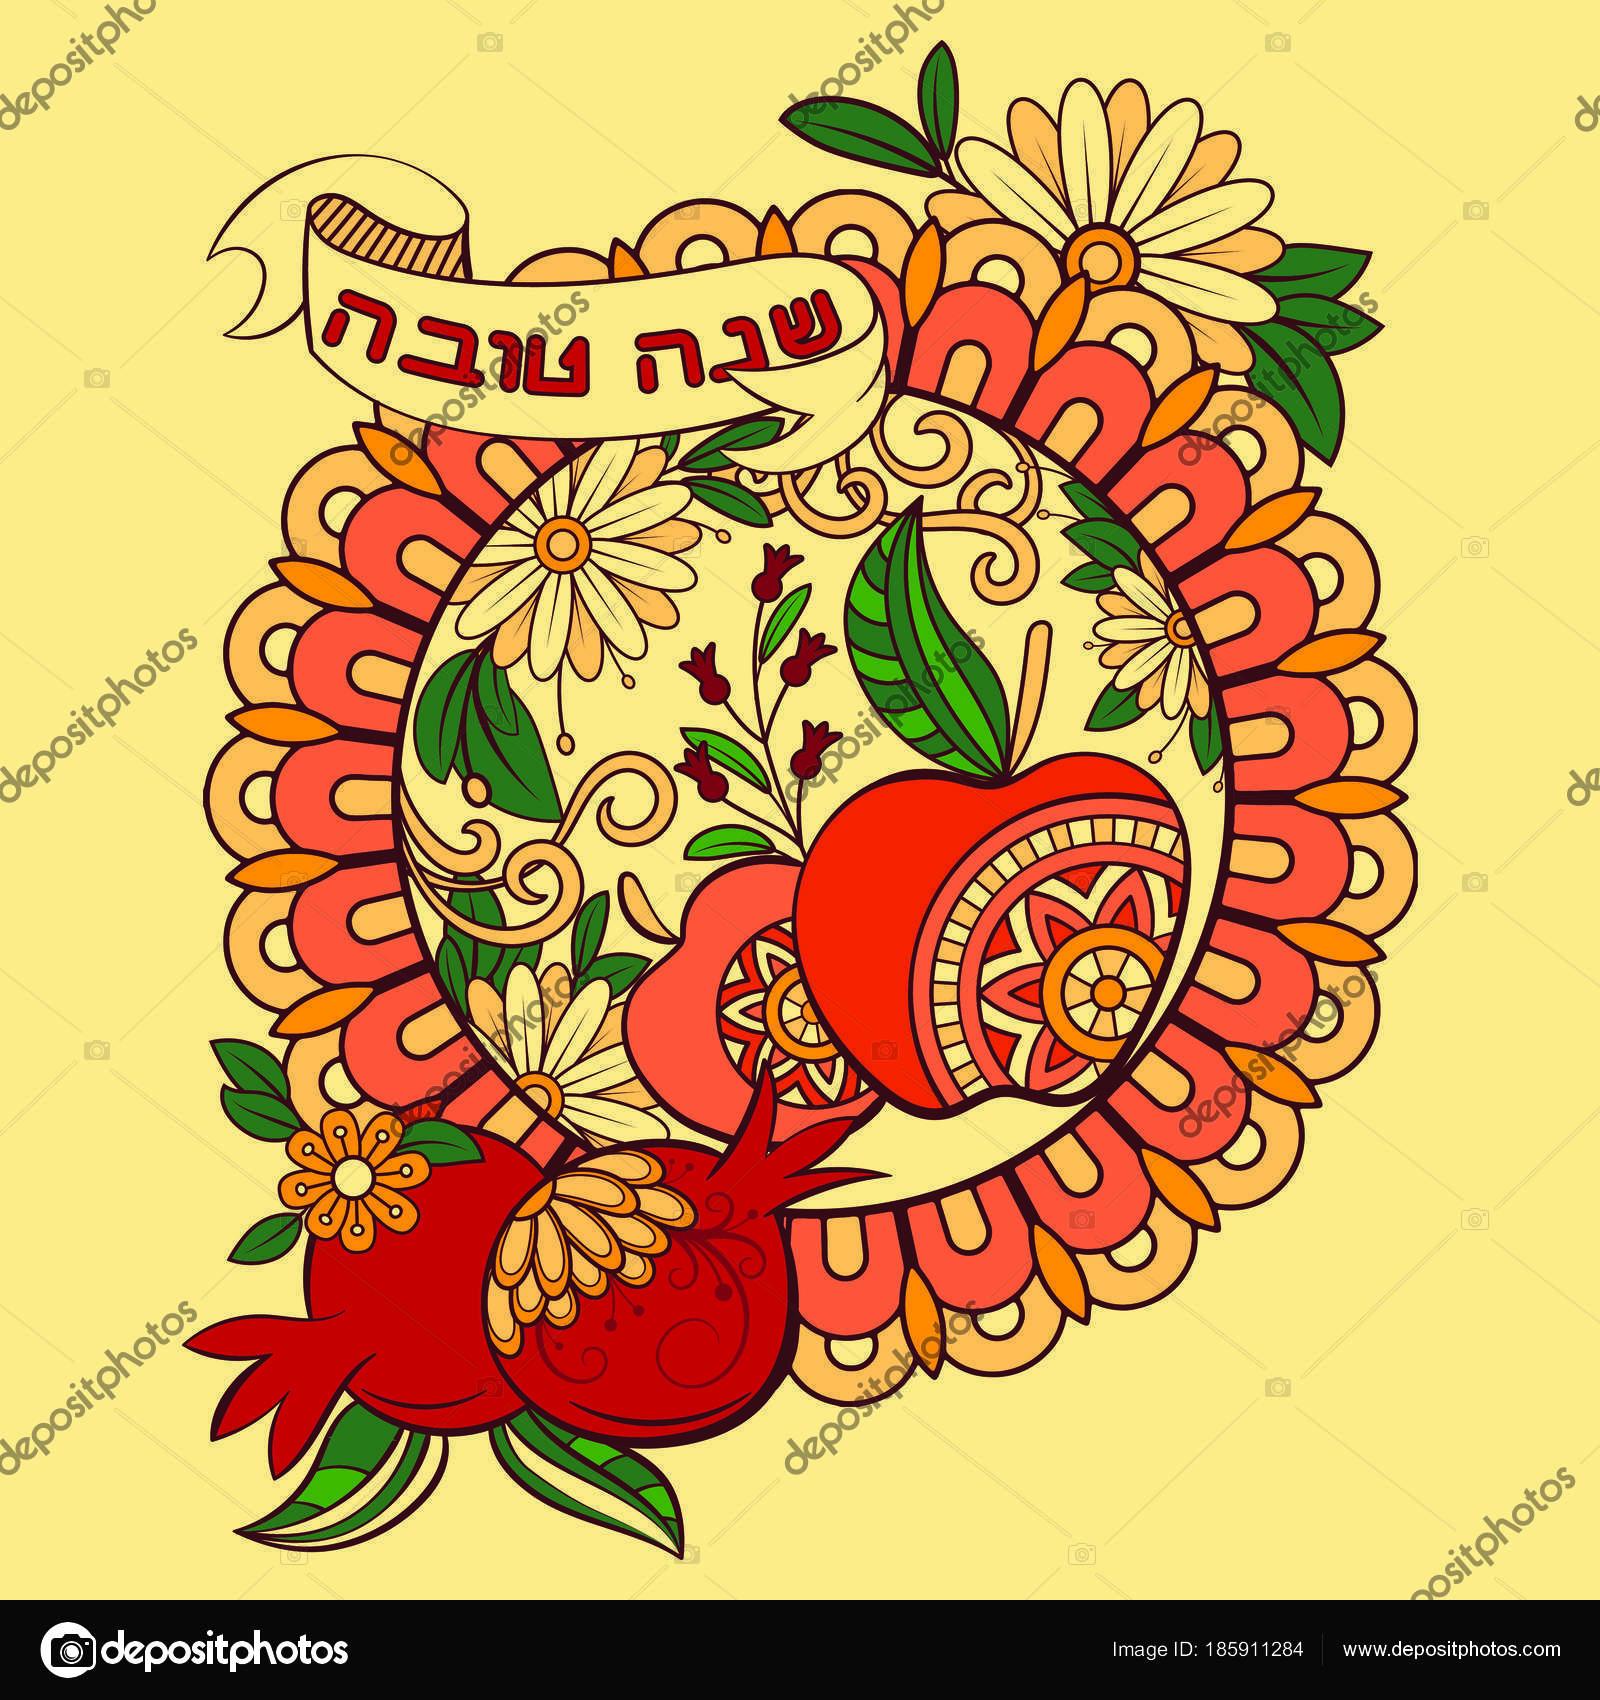 Rosh hashanah greeting card stock vector elinorka 185911284 rosh hashanah greeting card stock vector m4hsunfo